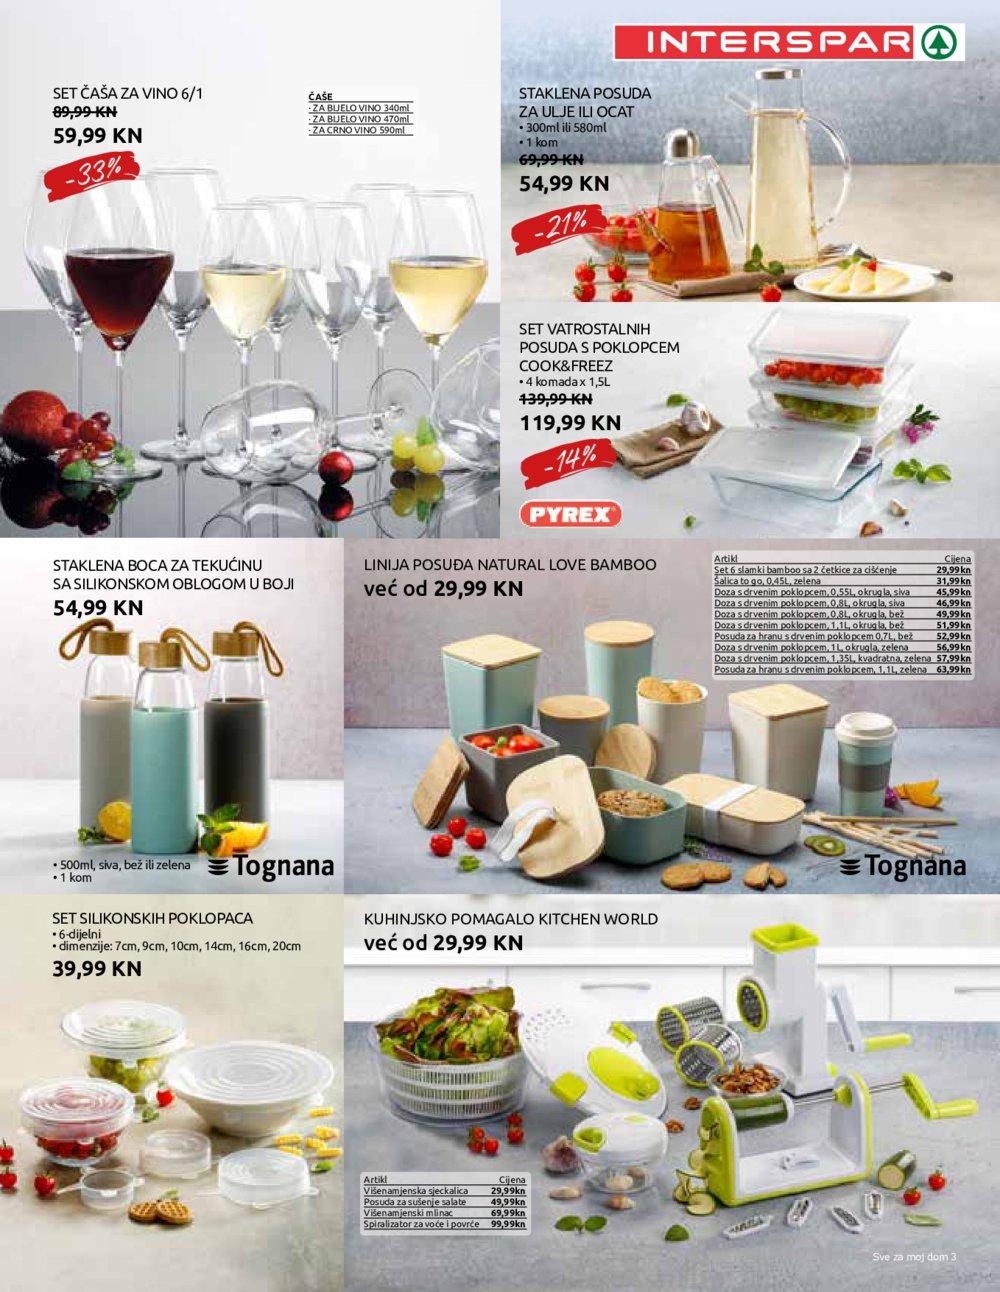 Interspar katalog Kućanstvo 09.09.-06.10.2020.